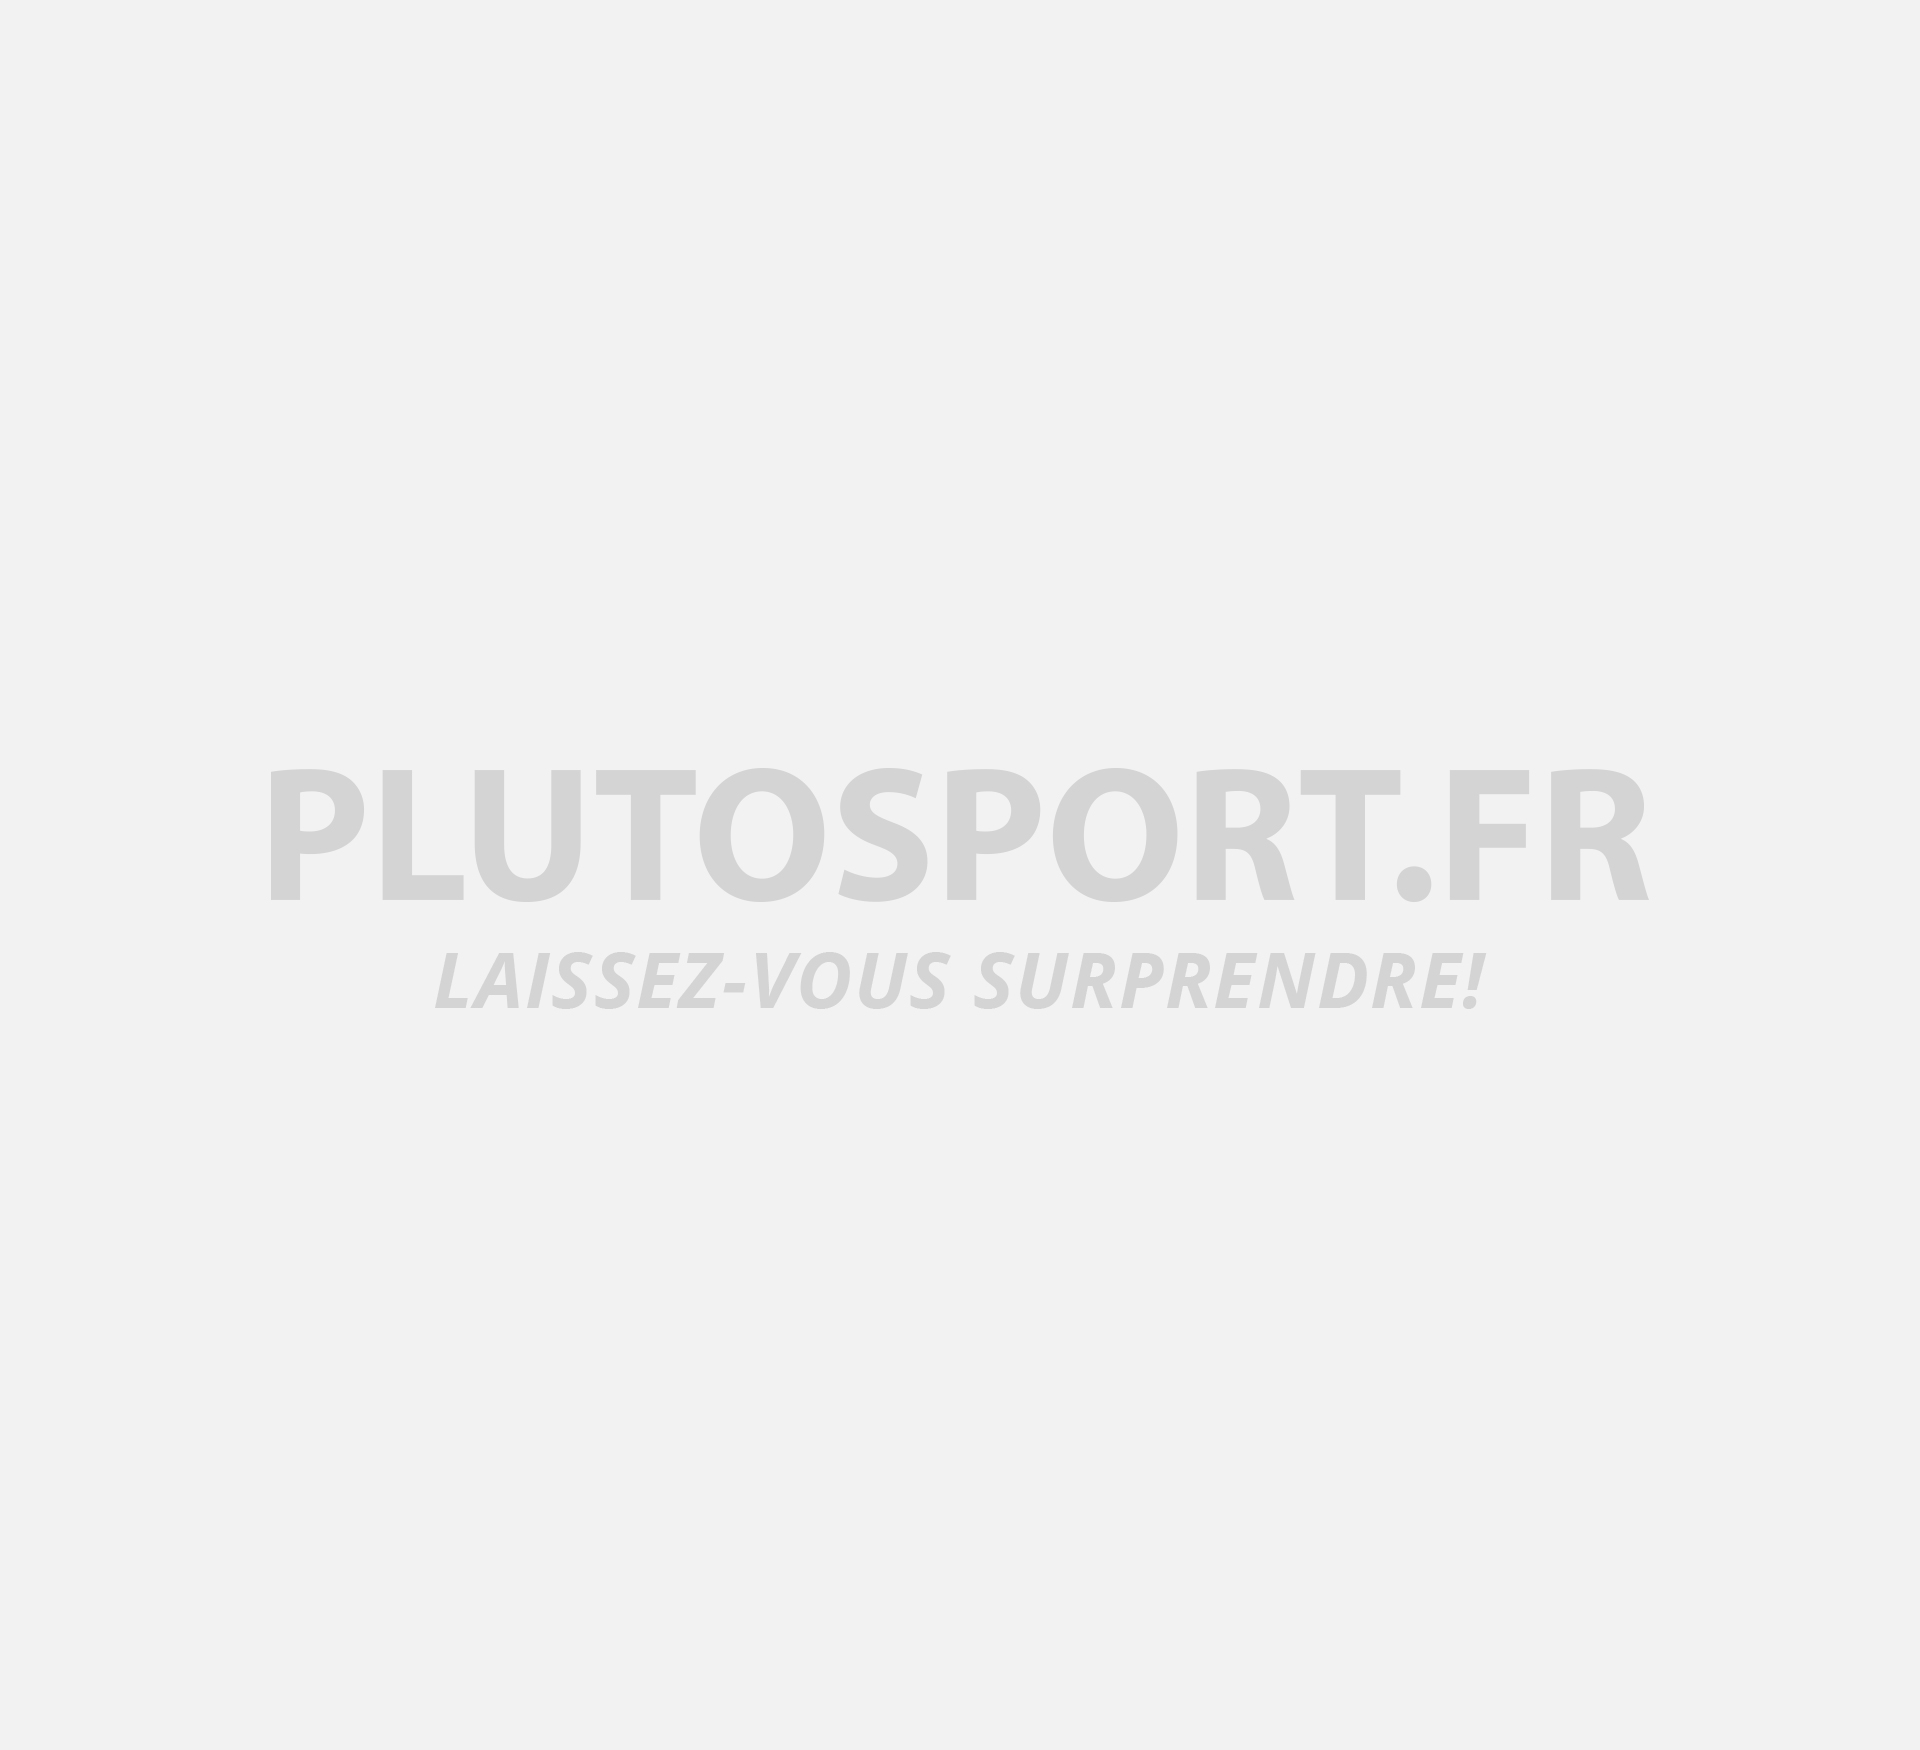 Nike Hypervenom Phelon 3 DF AG Pro, Chassures de football pour hommes